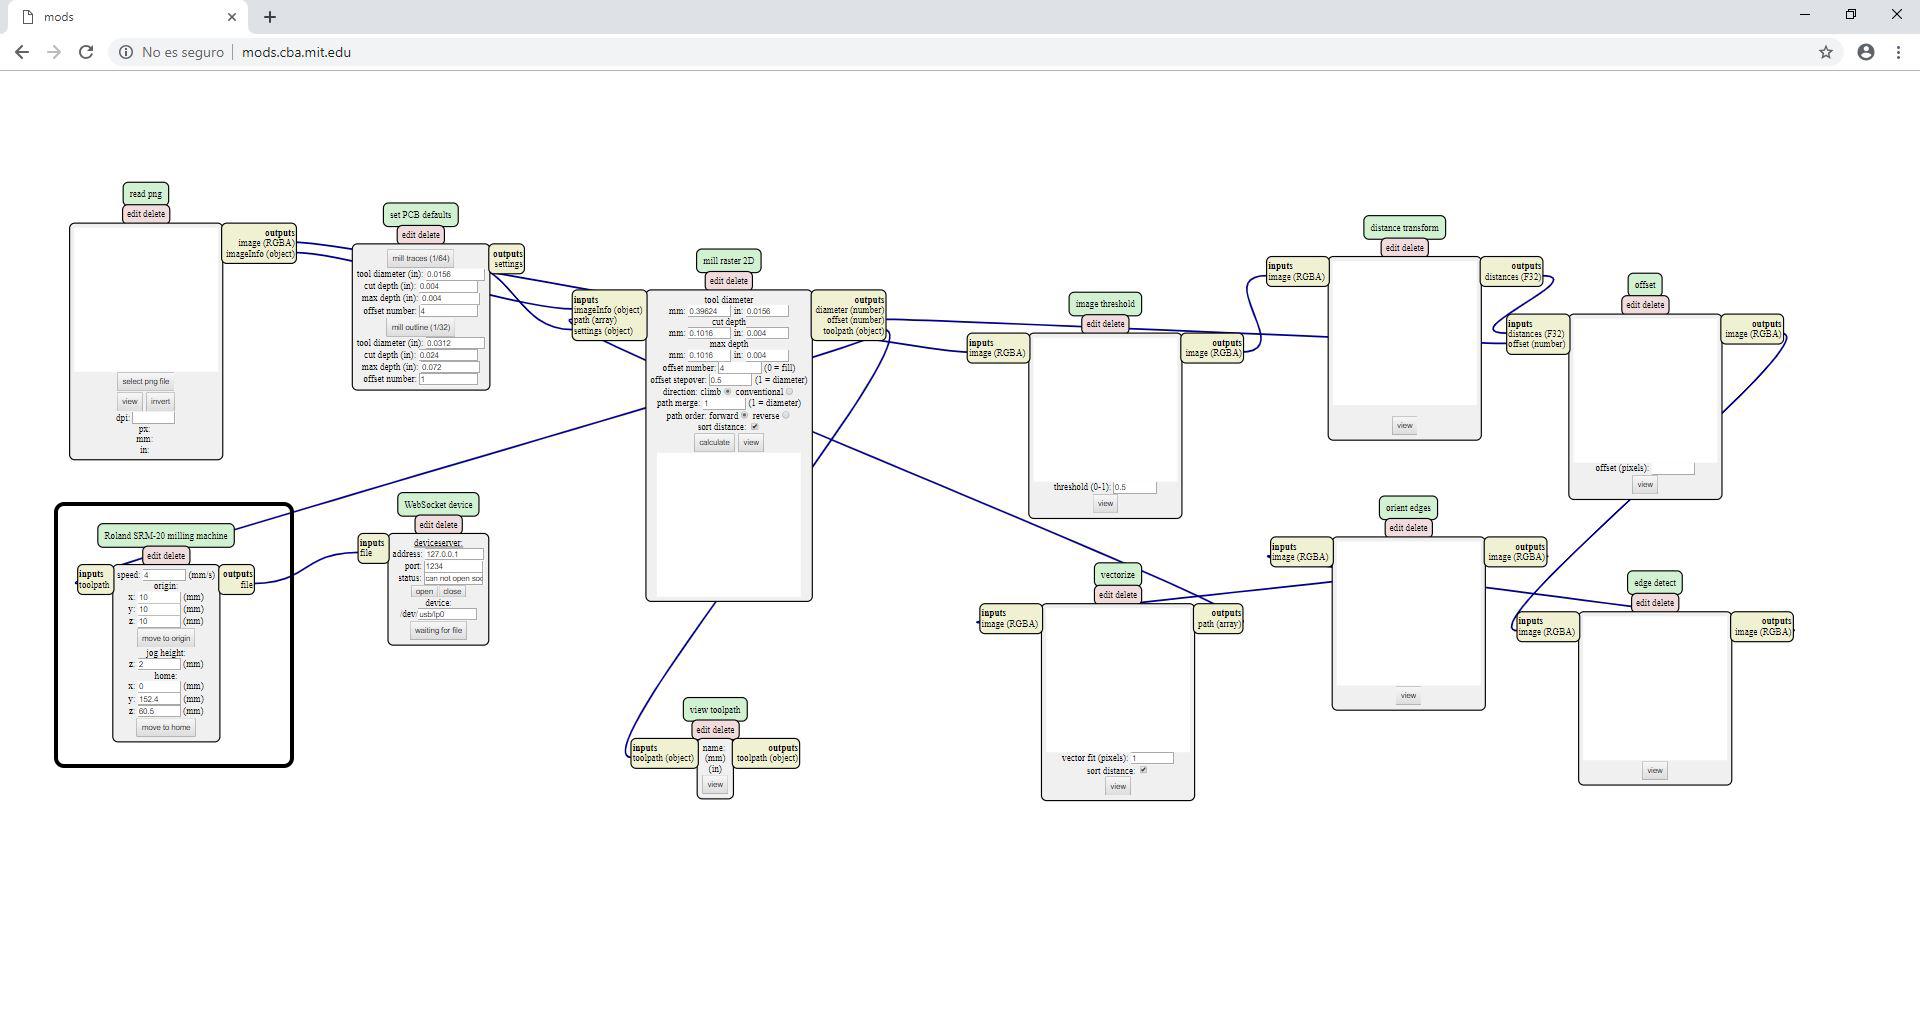 week04_electronic_production/mods/3.jpg